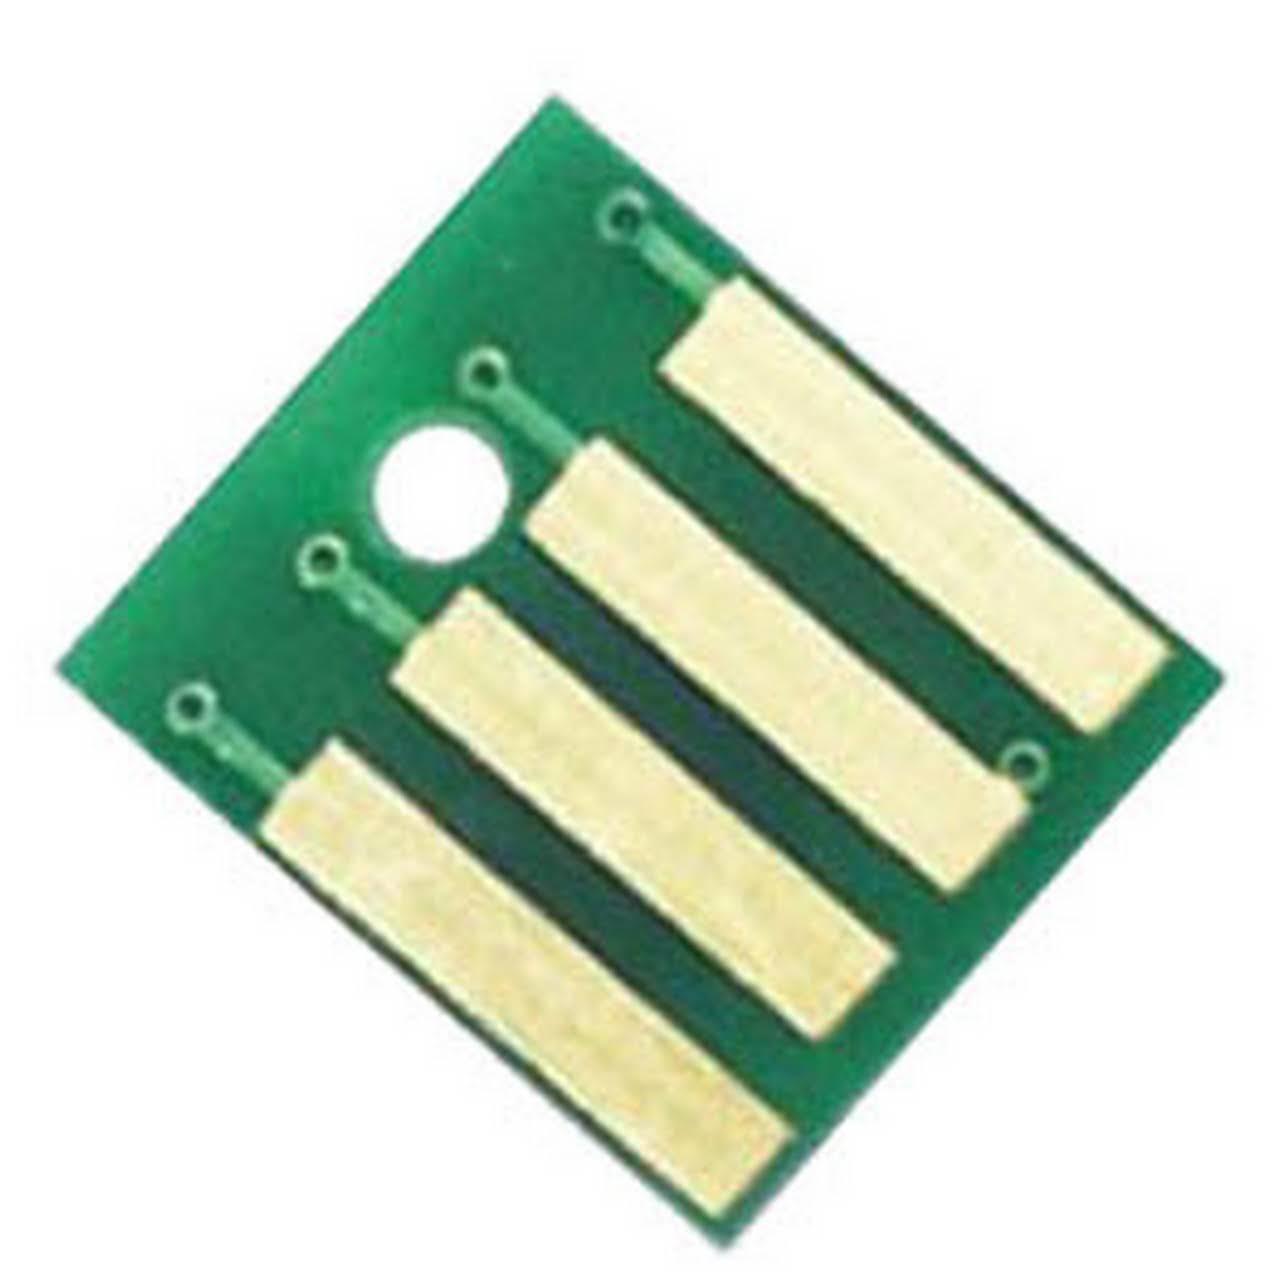 Chip compatível Lexmark [24F0009] MX317/MX417/MX517/MX617 20.000 Páginas - Cartucho & Cia